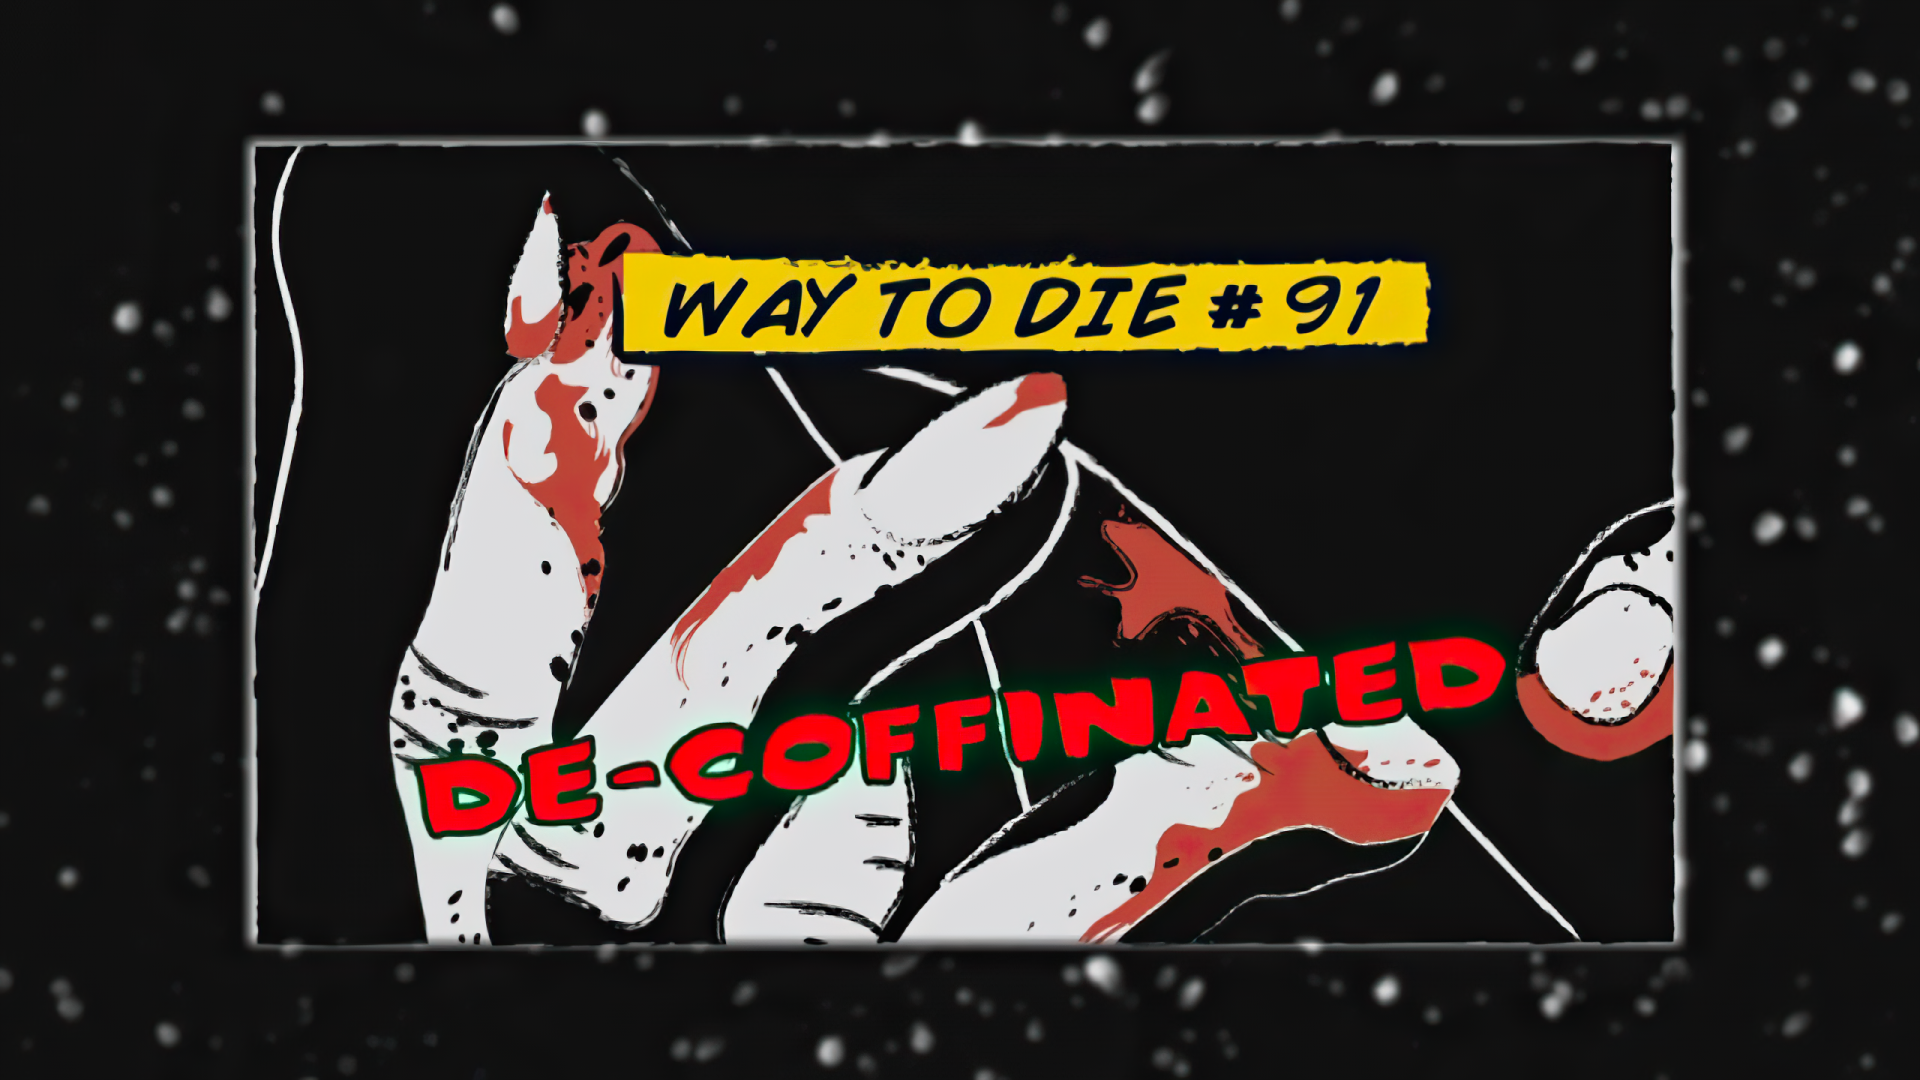 De-Coffinated